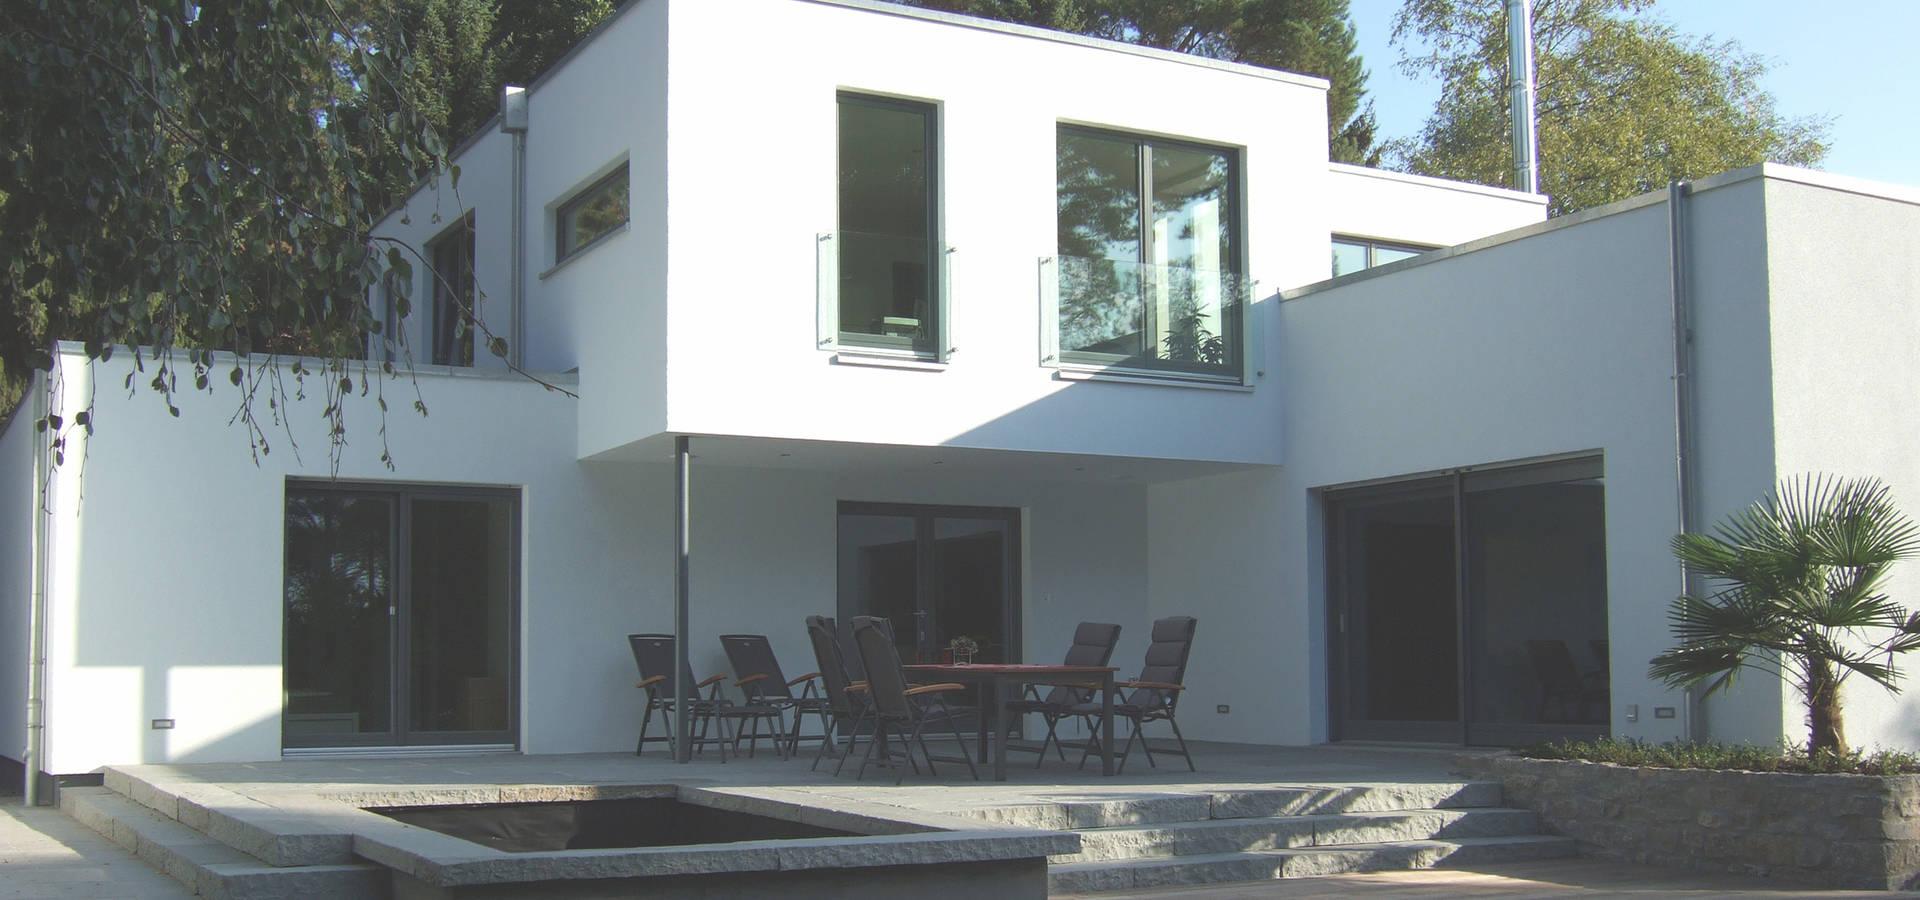 zymara und loitzenbauer architekten bda